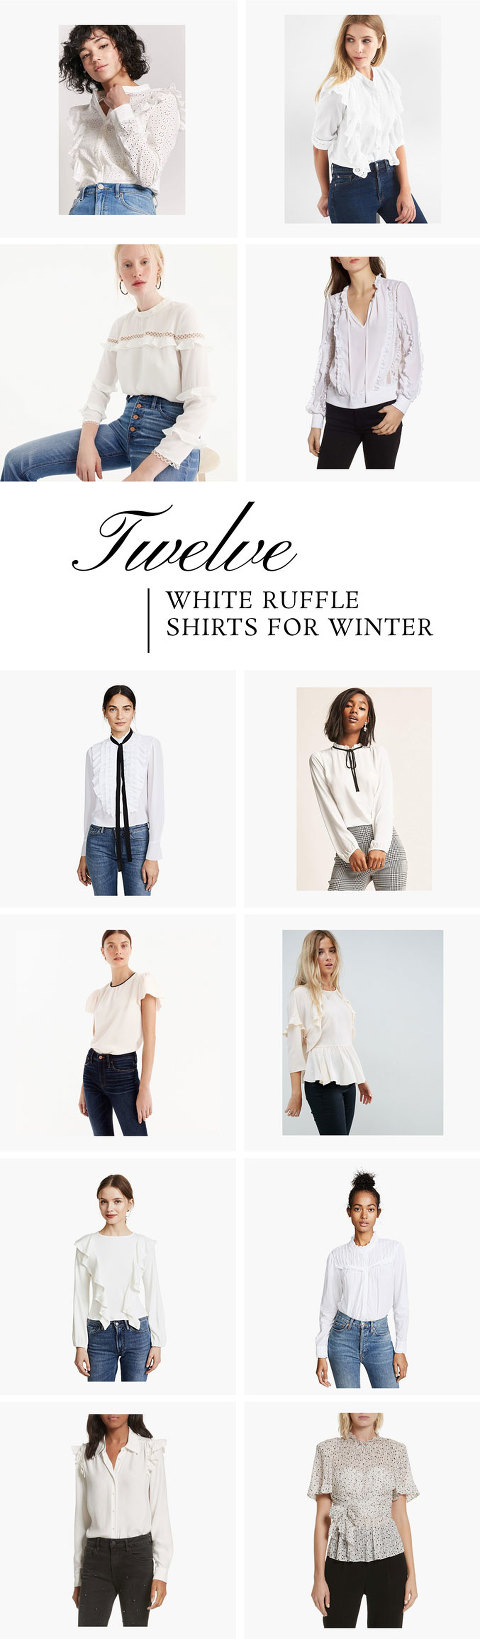 12 White Ruffle Shirts For Winter